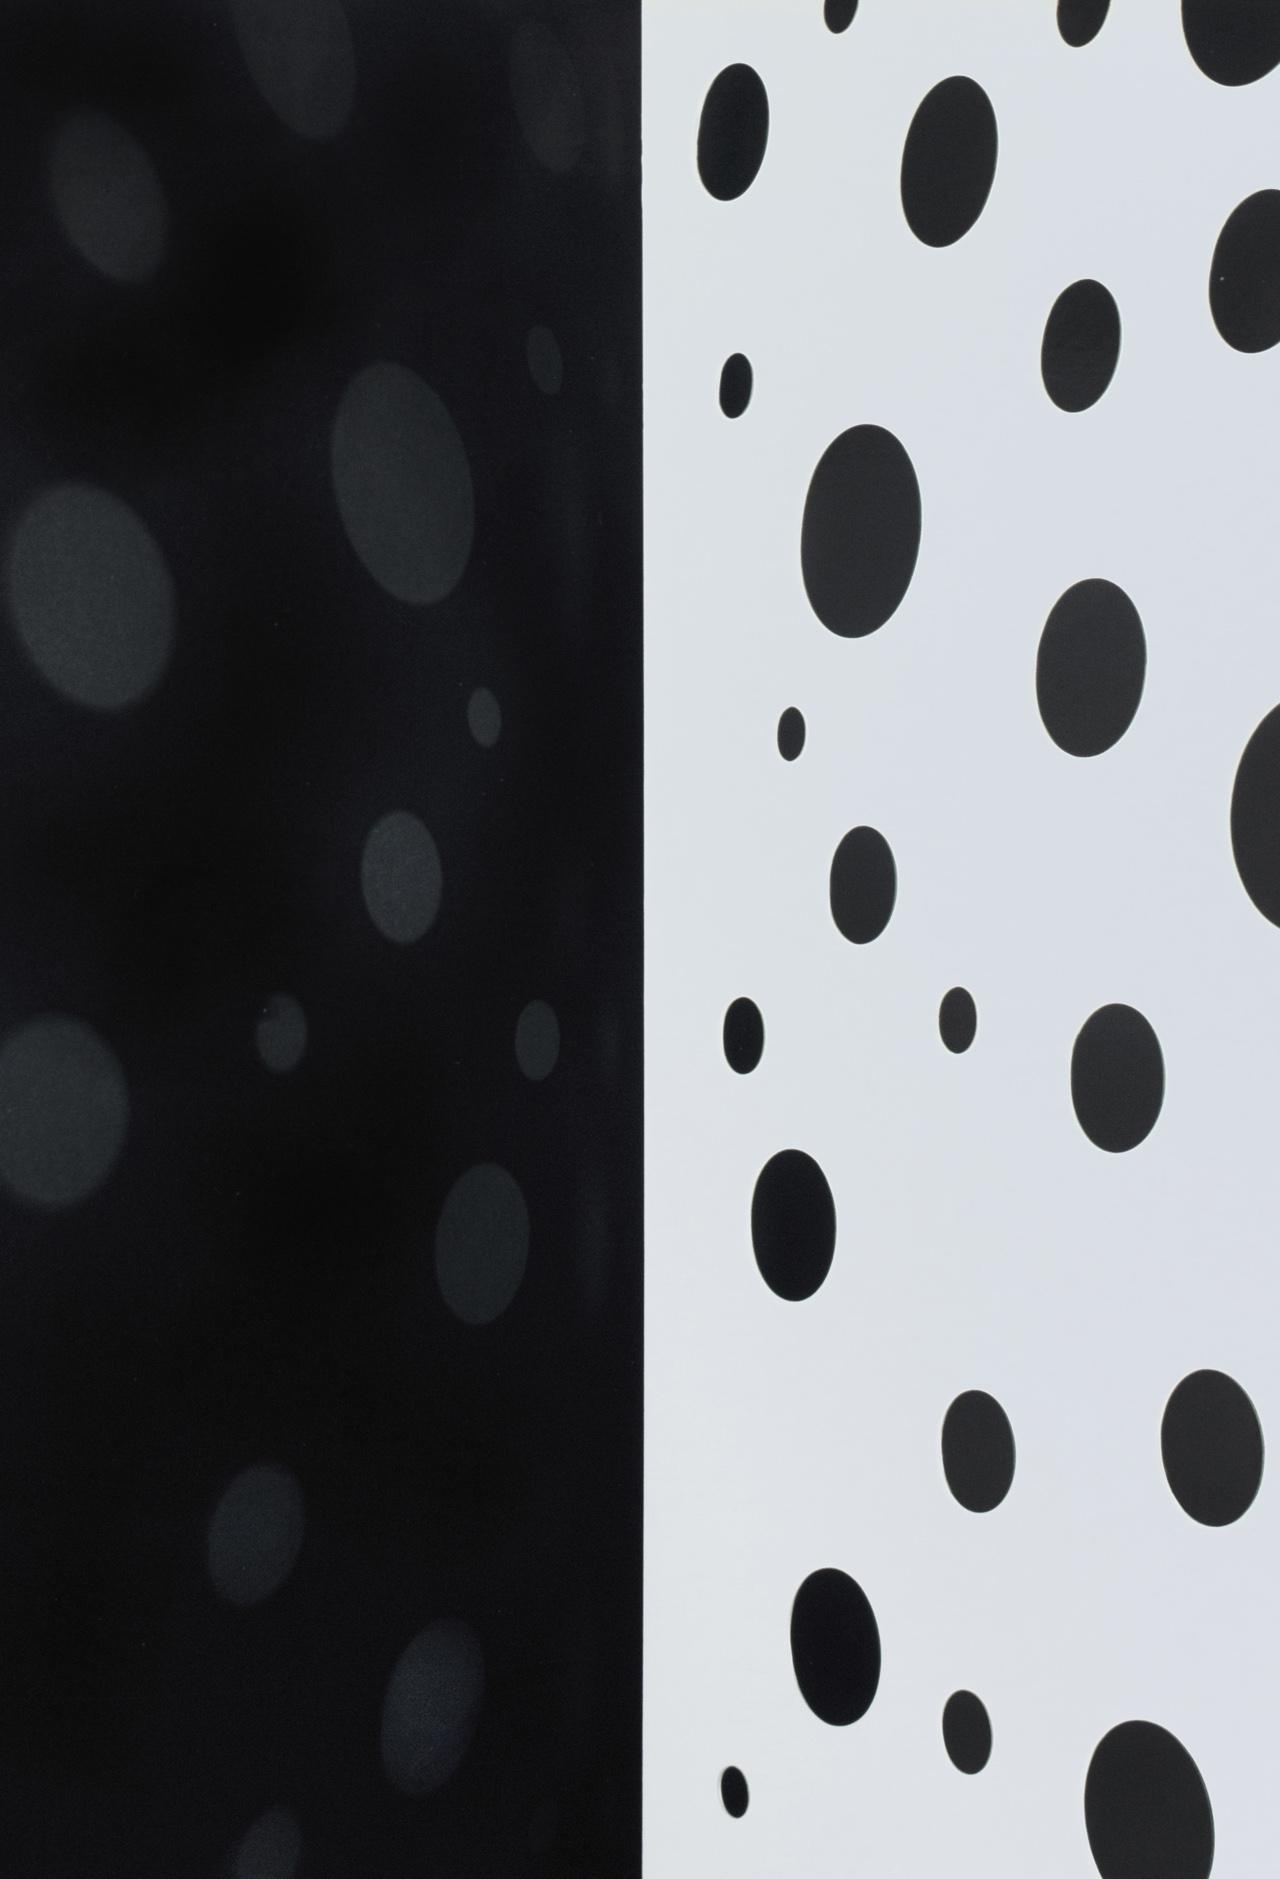 JACKY REDGATE   Light Throw (Mirrors) Fold - Black and White  2019 Chromogenic photograph handprinted 185 x 127 cm